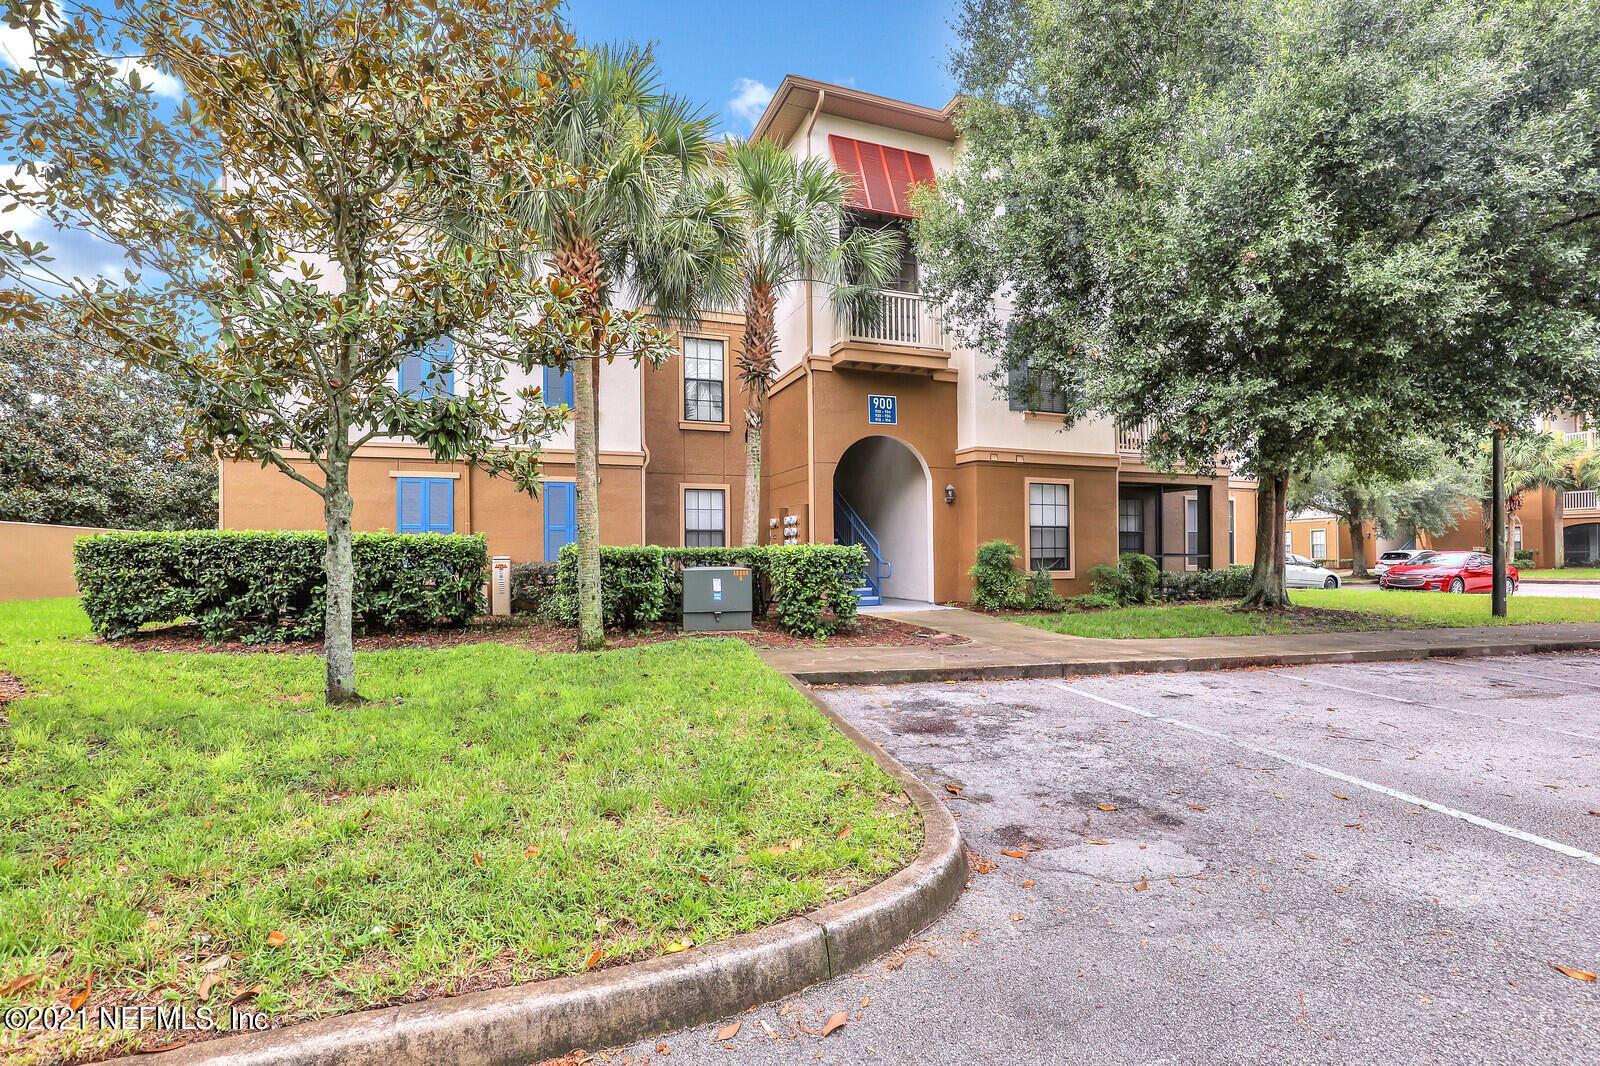 12700 BARTRAM PARK BLVD, Jacksonville, FL 32258 - MLS#: 1128727